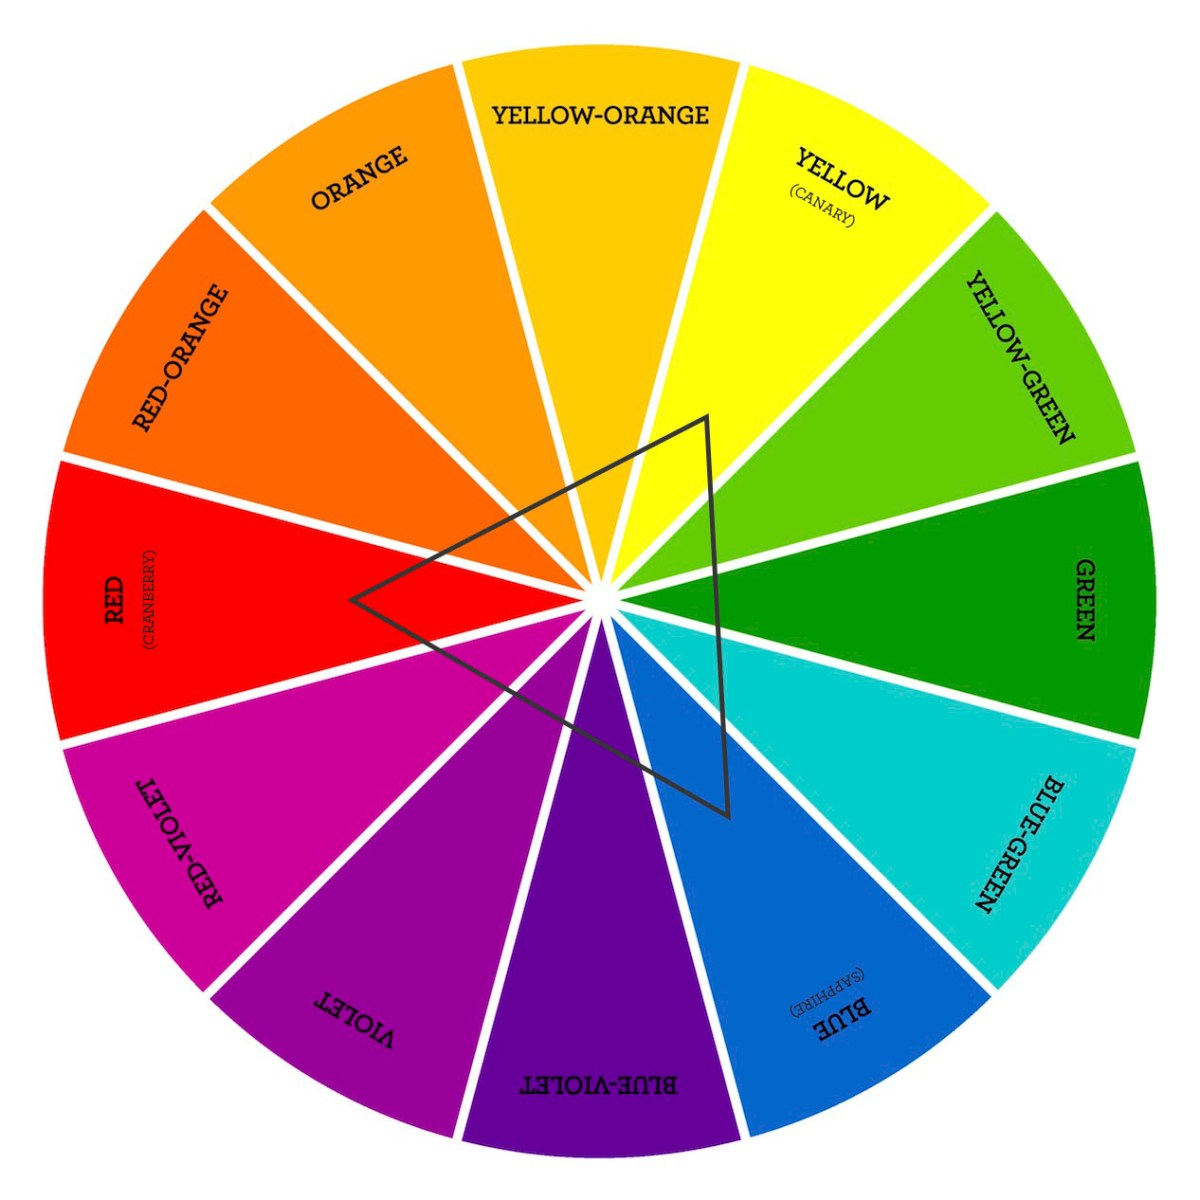 Triadic Color Combinations #ctmh #closetomyheart #ctmhstargazer #stargazer #star #gazer #colortheory #color #theory #redyelloblue #red #yellow #blue #canary #cranberry #sapphire #scheme #combination #vivacious #bright #harmony #harmonious #balance #balanced